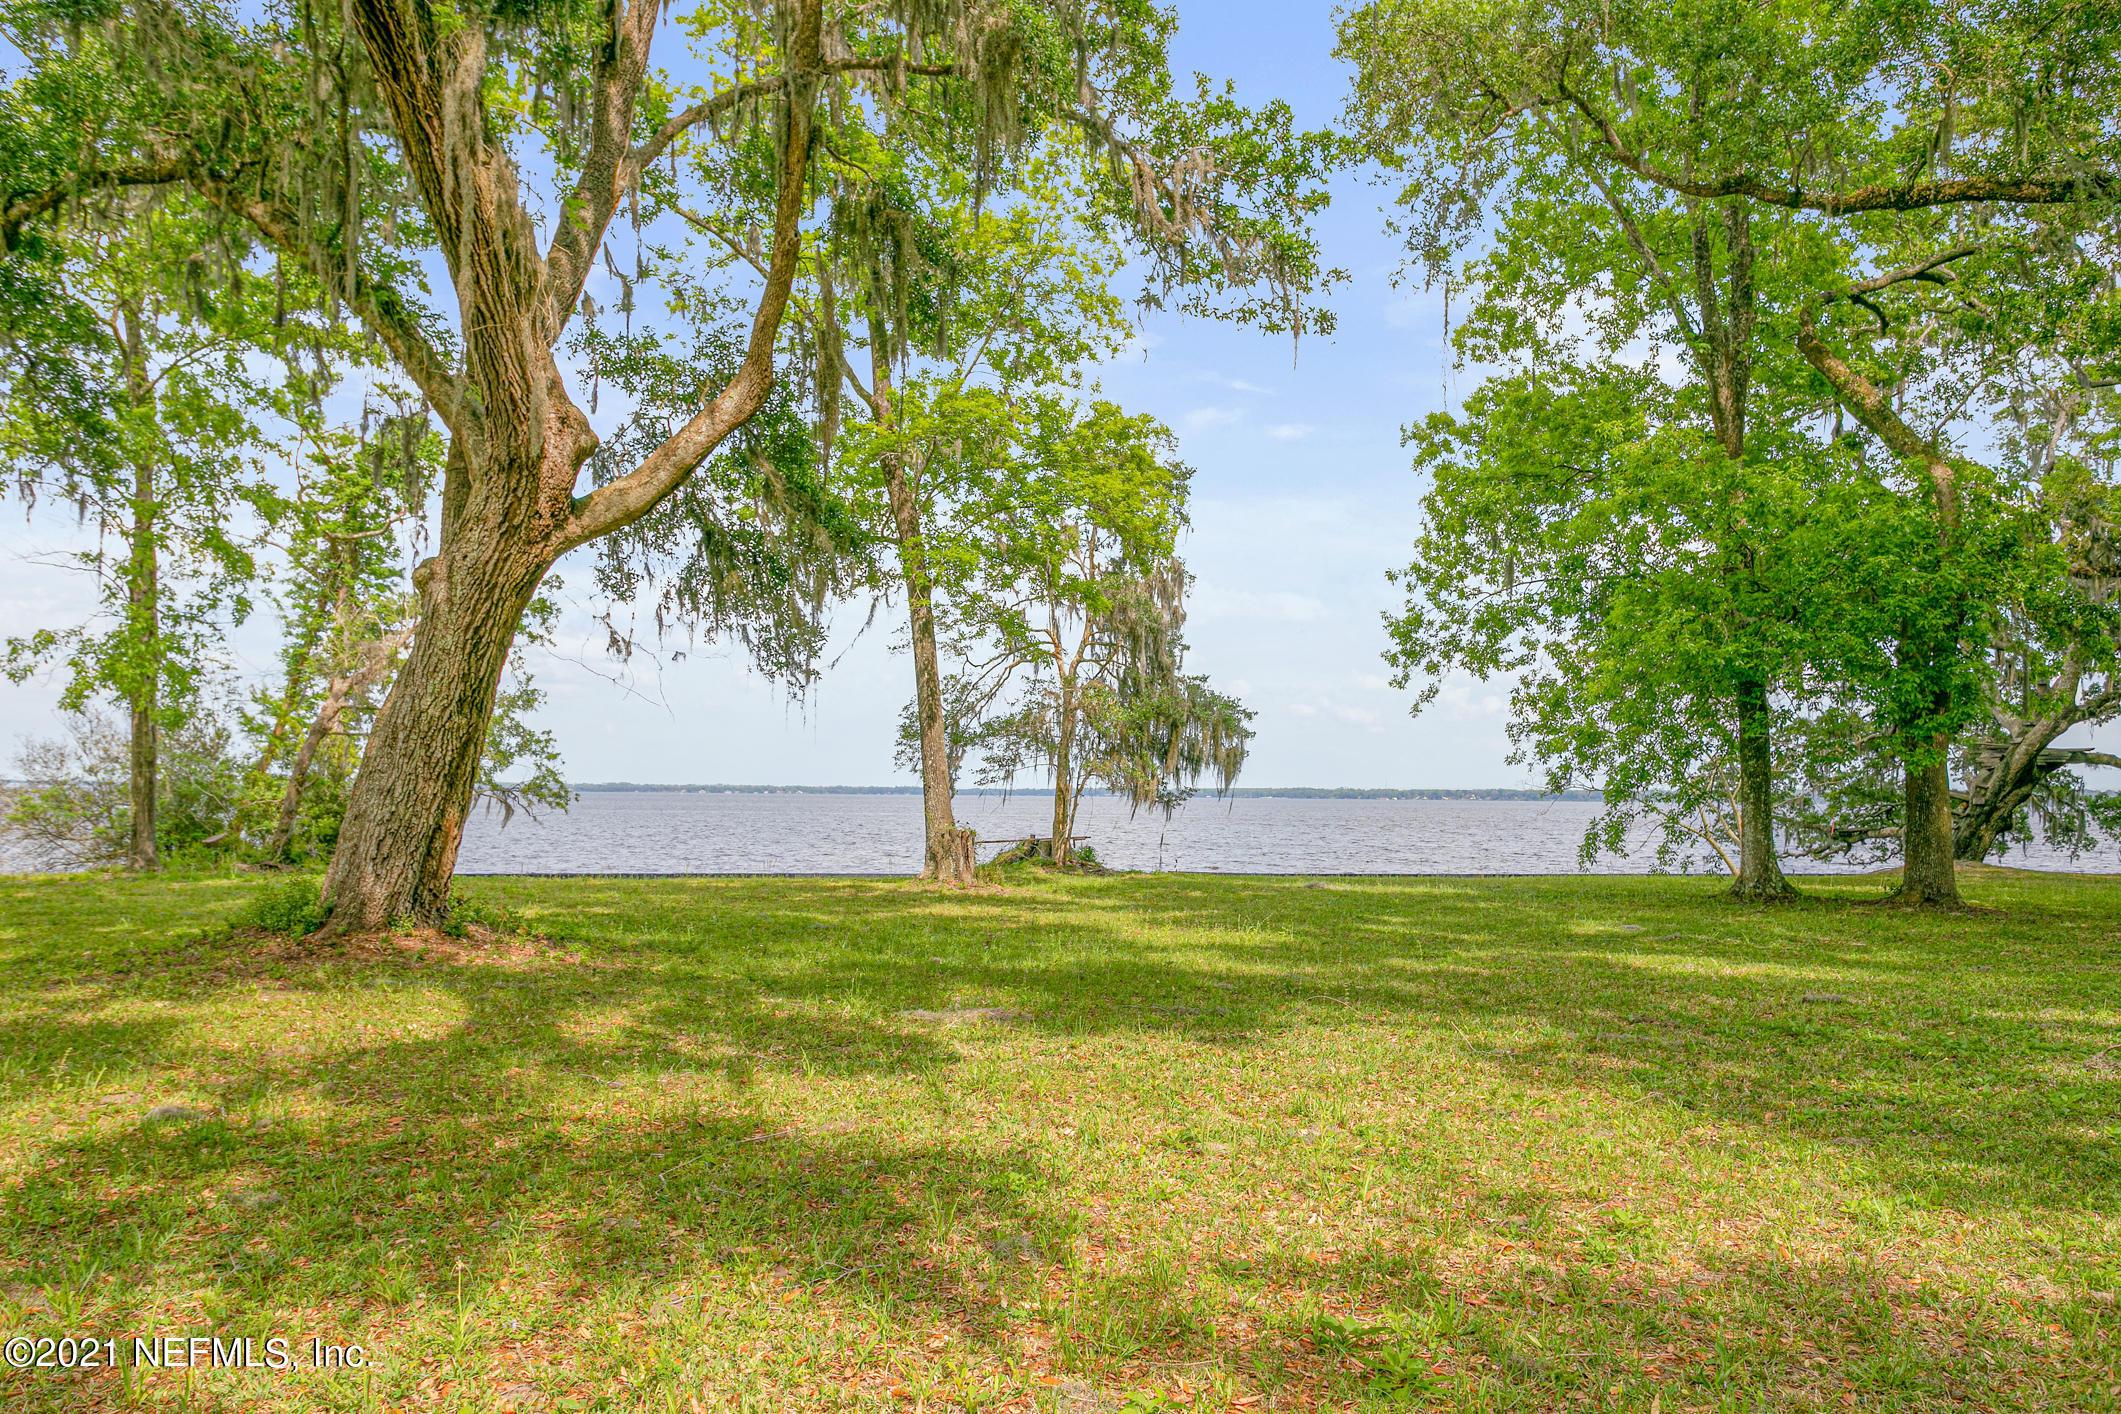 0 CEDAR RUN, FLEMING ISLAND, FLORIDA 32003, ,Vacant land,For sale,CEDAR RUN,1104602